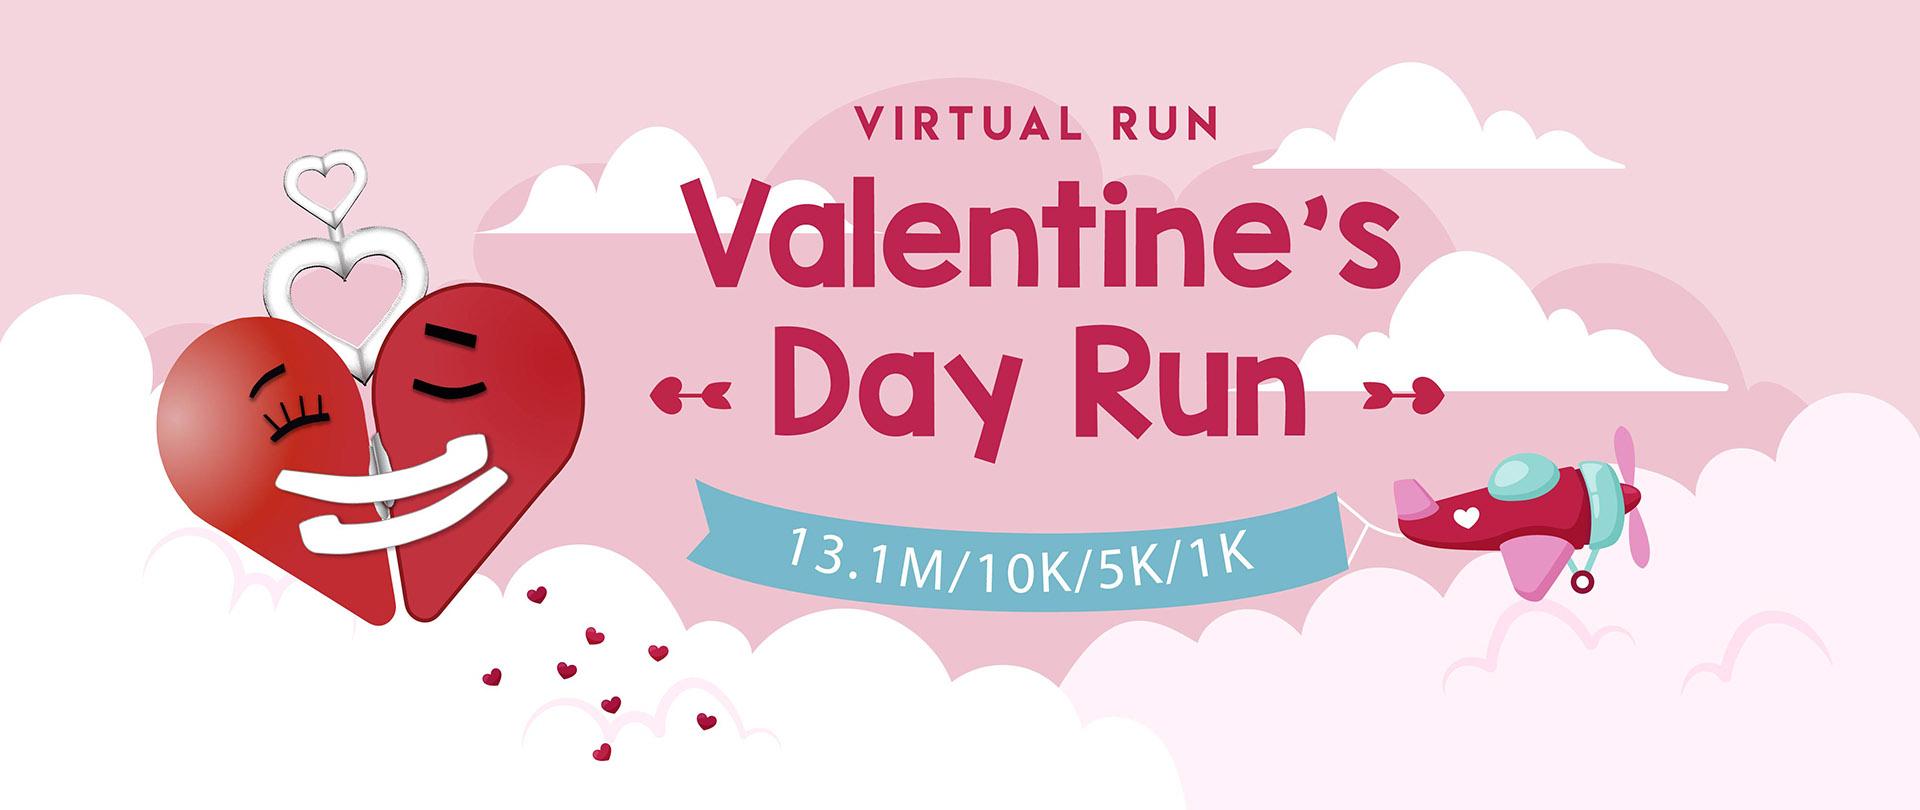 Valentines's Day Run